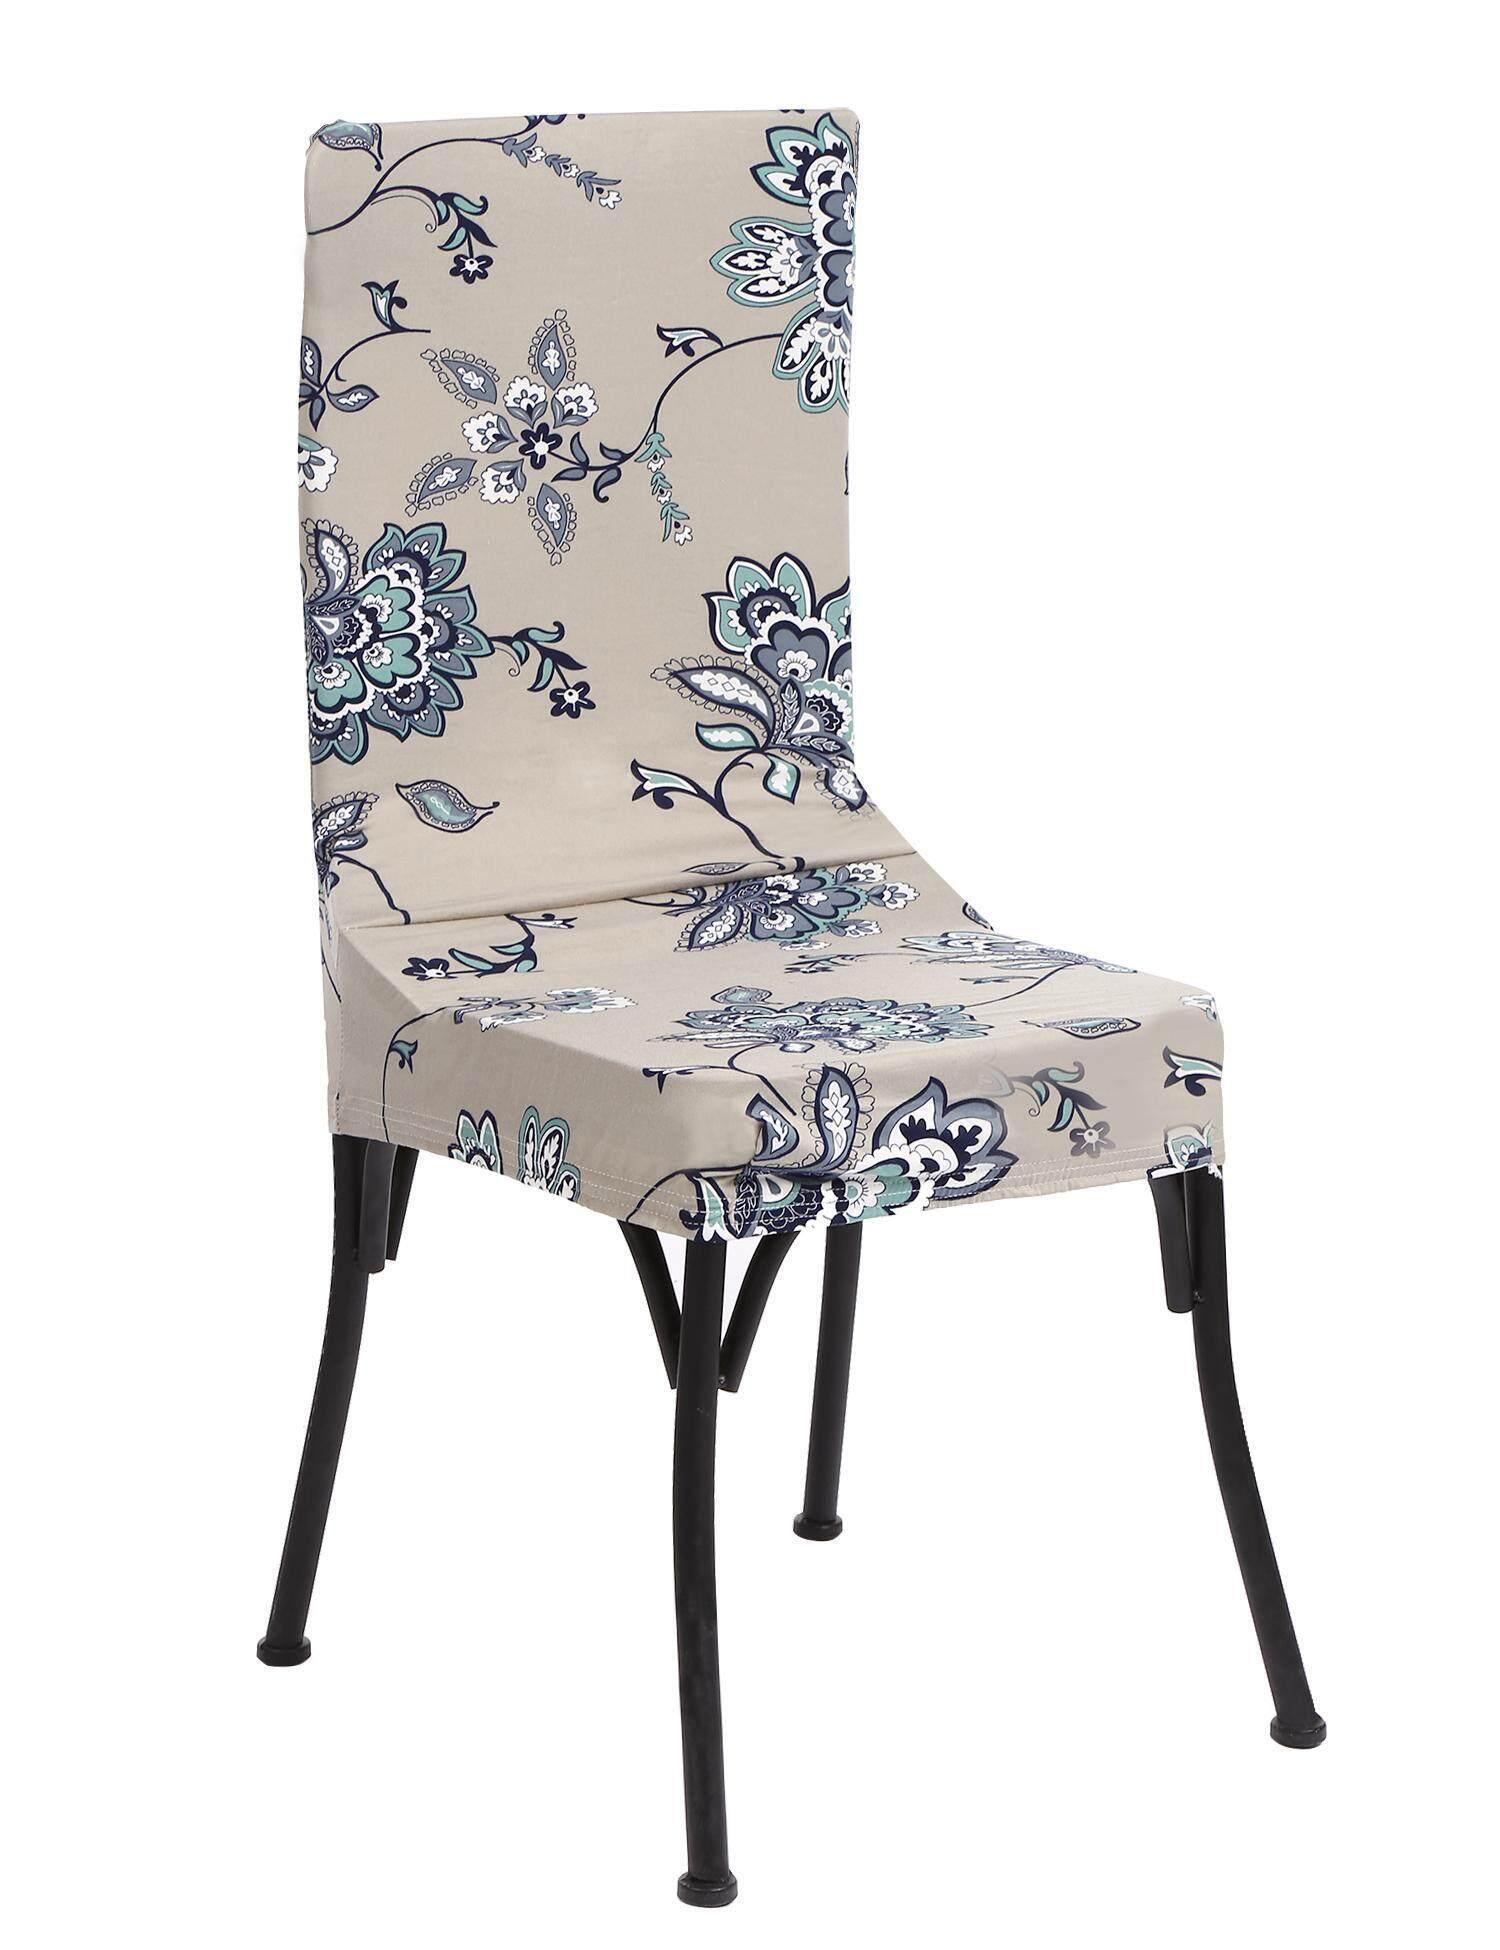 Azone Keuntungan Rendah Dapat Dilepaskan Elastis Regang Slipcovers Dining Room Kursi Kursi Sarung Dekorasi-Internasional